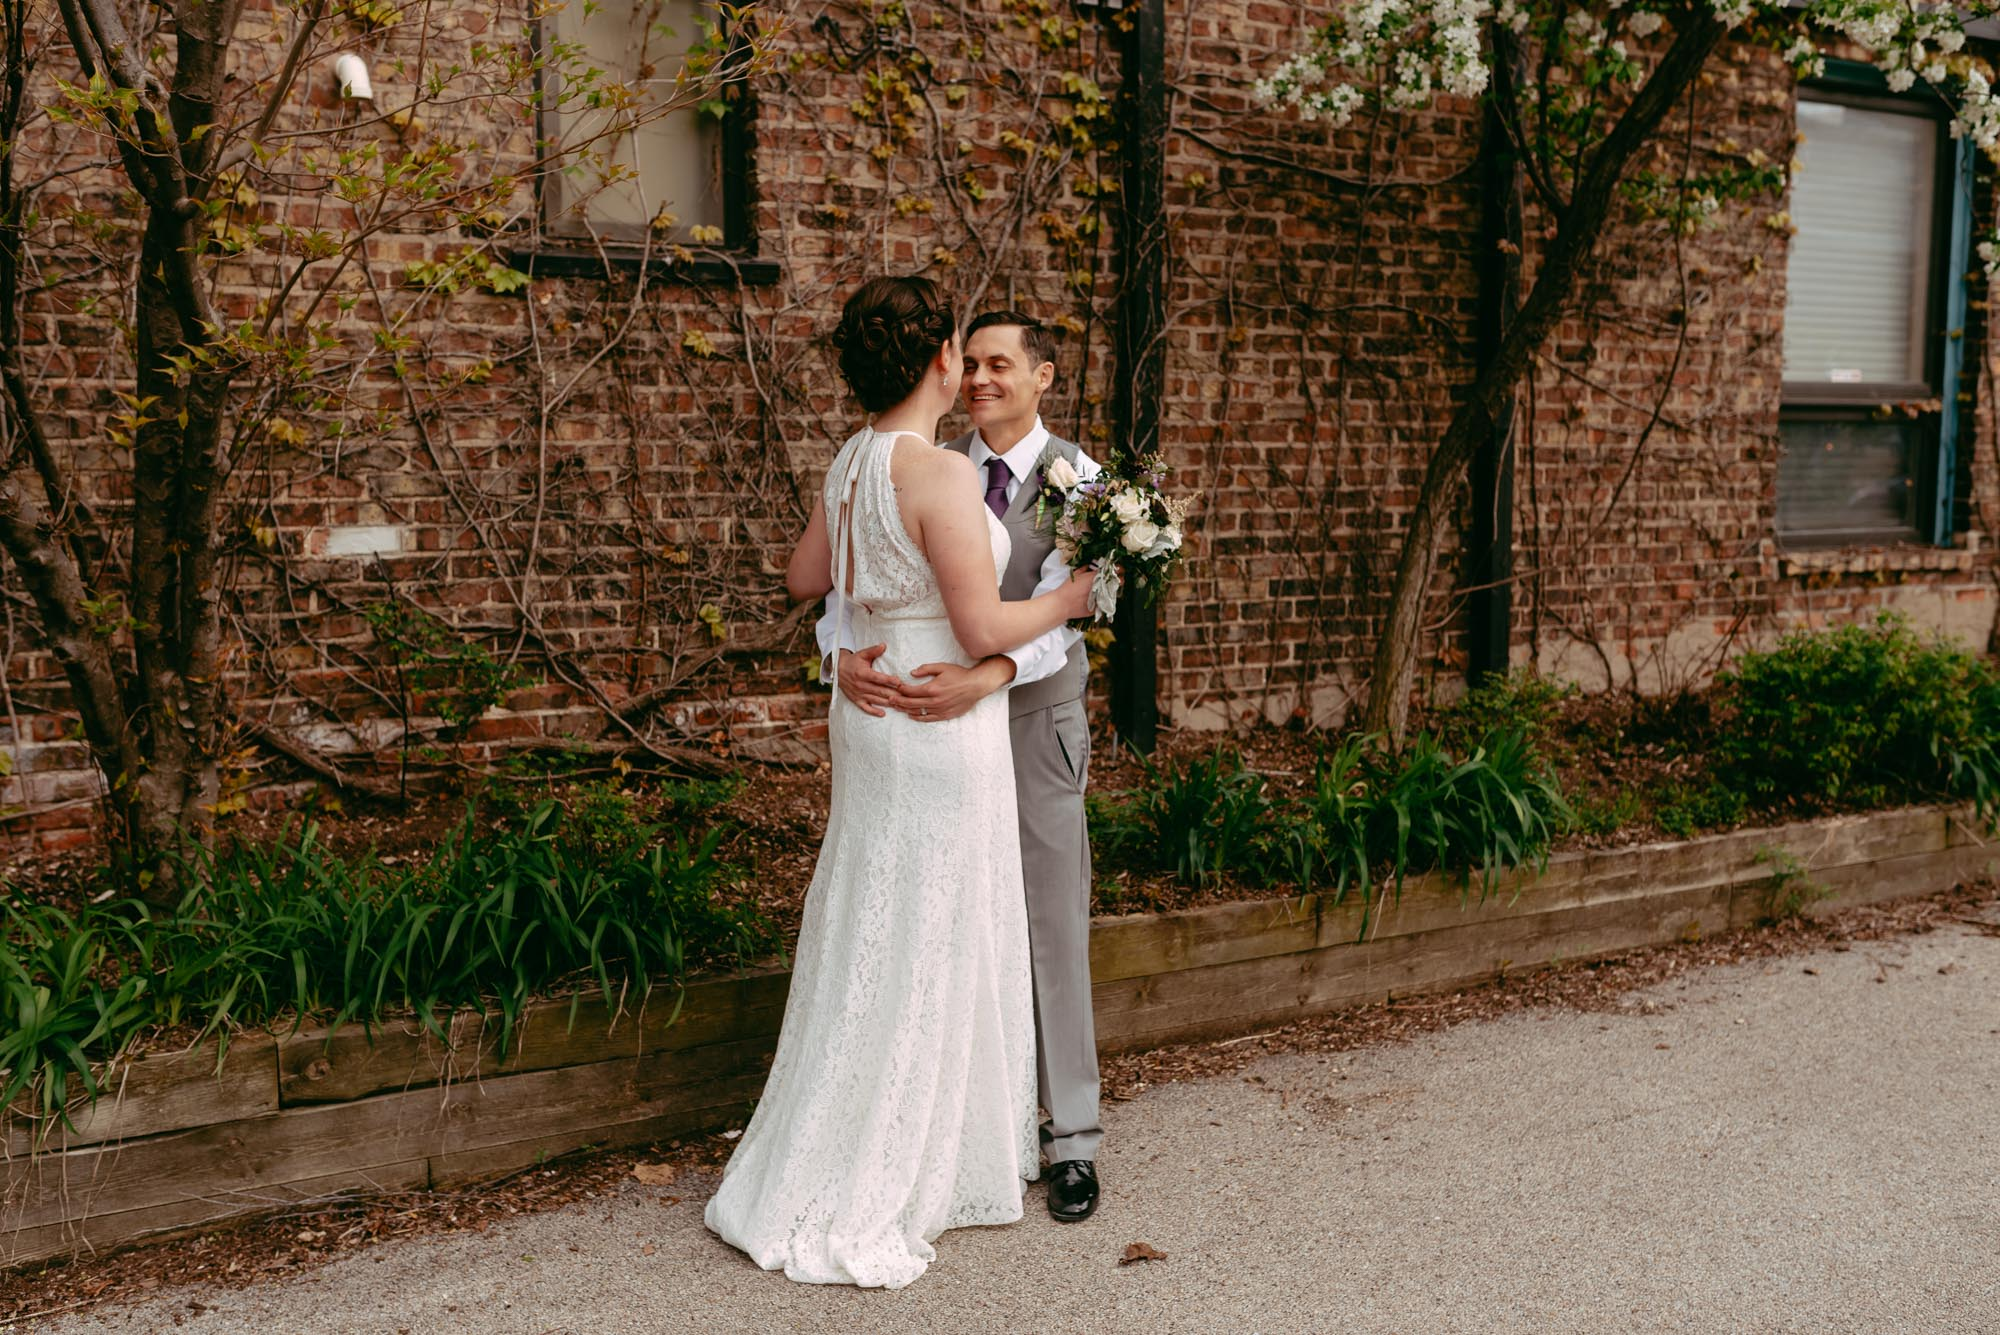 prairie-street-brewhouse-wedding-Rockford-IL-wedding-photographers-194.jpg